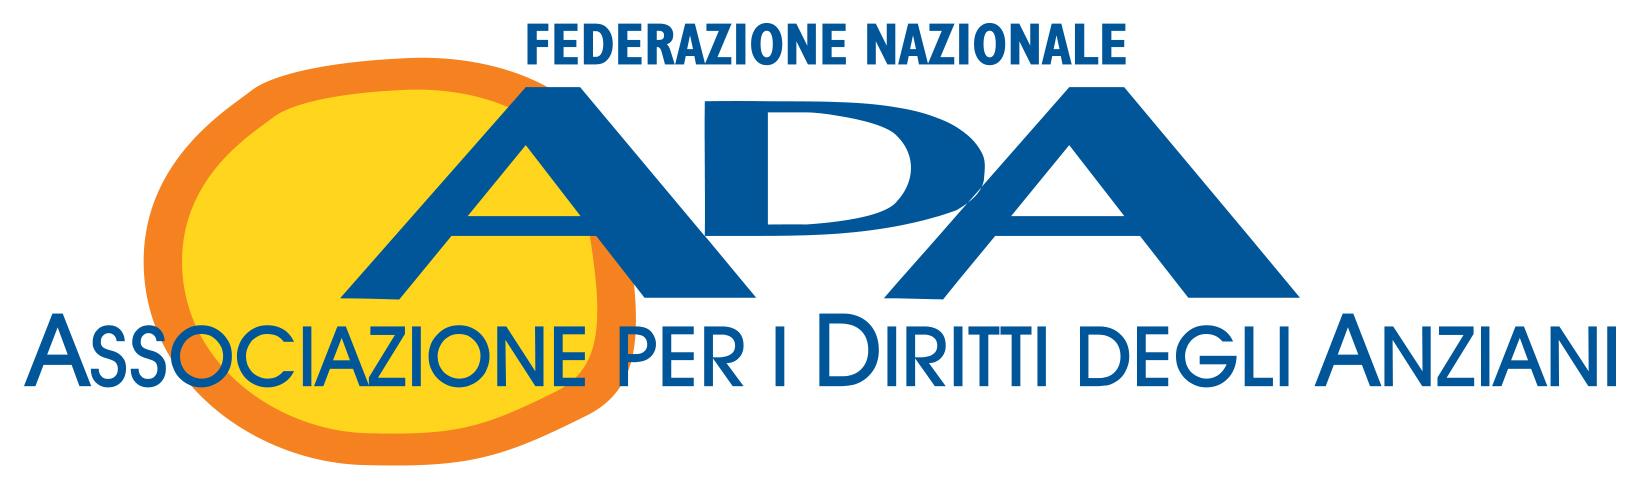 Federazione Nazionale Associazione per i Diritti degli Anziani